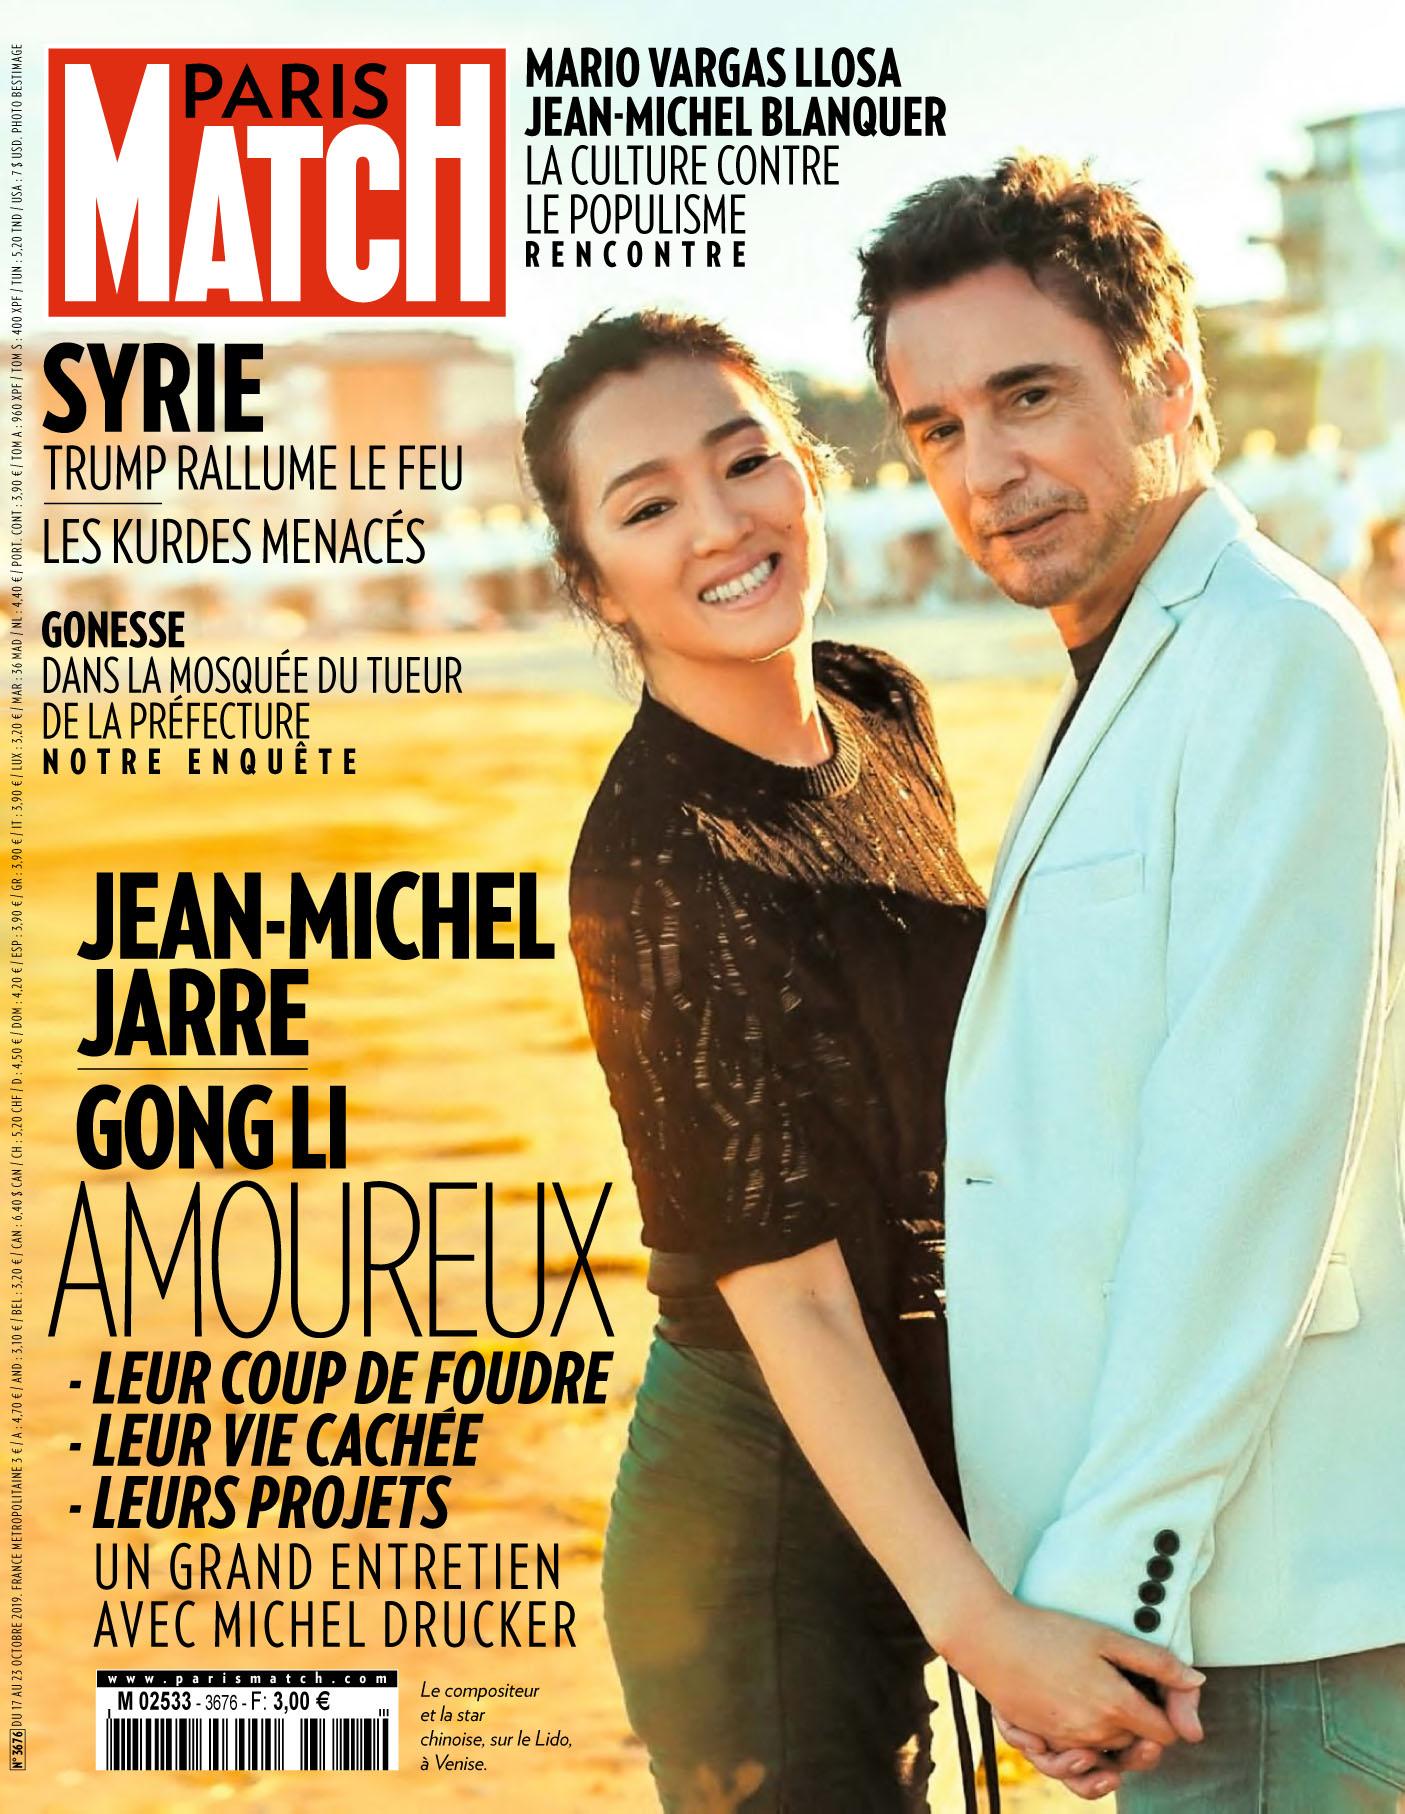 Paris Match 3676 191017 JM Jarre-1.jpg